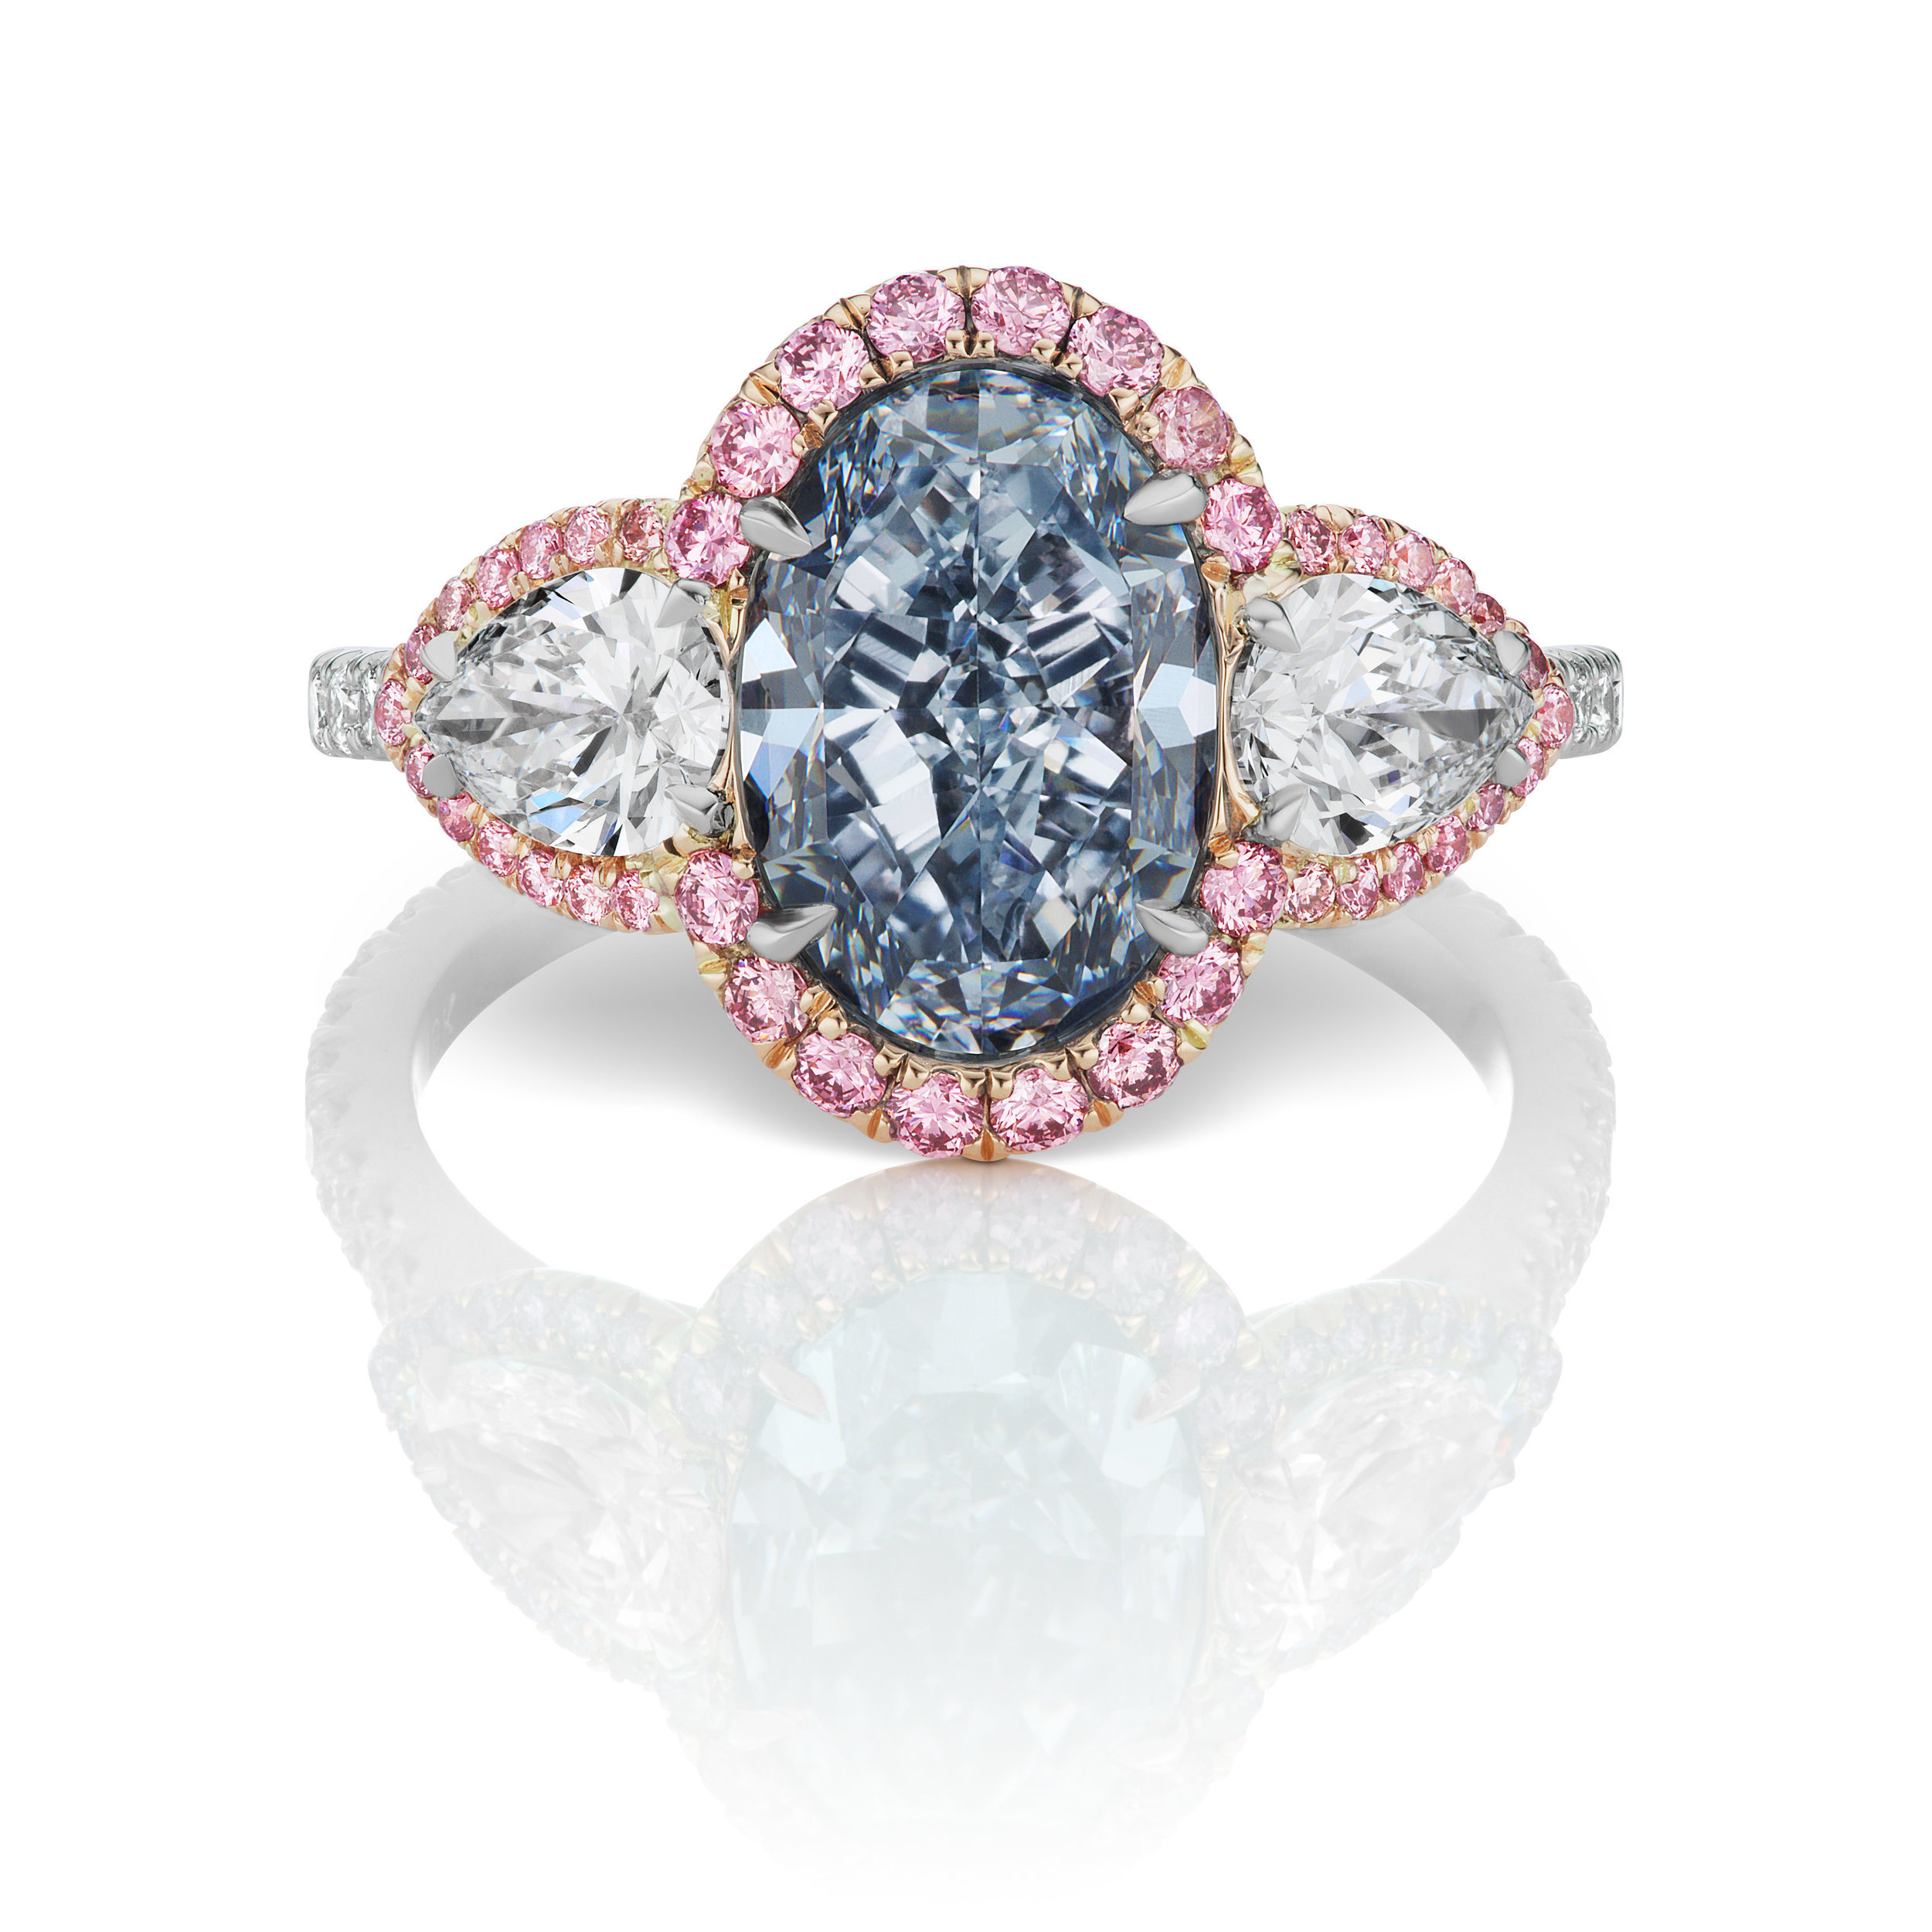 3.04 carat intense blue oval shaped diamond vs set platinum accented by argyle pink diamonds designed by Scott West